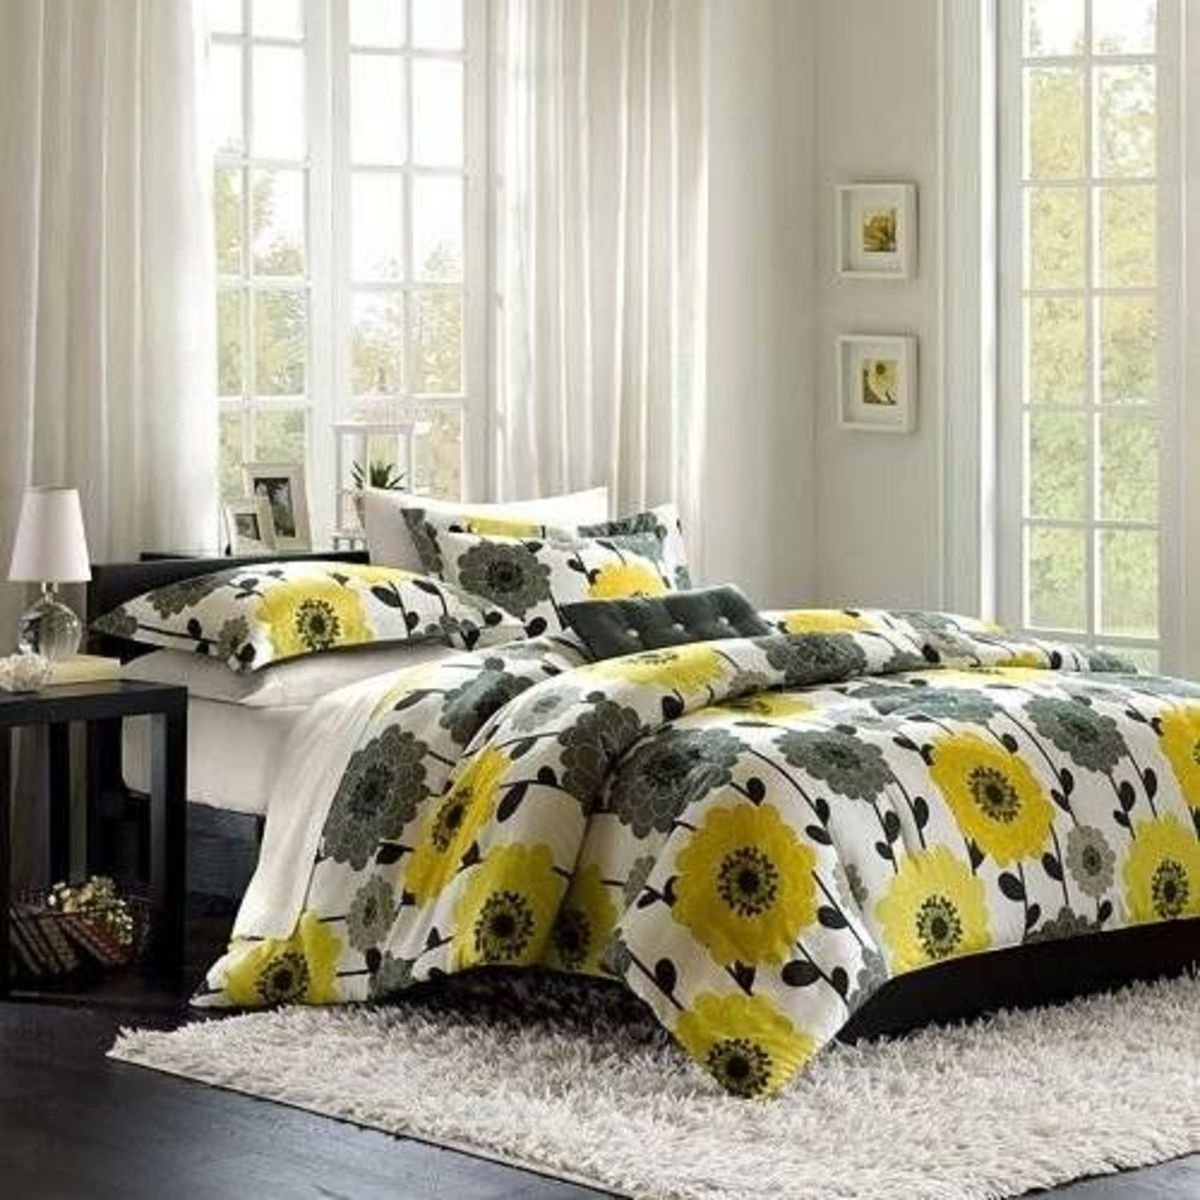 Mizone Anthea 4 Piece Comforter Set